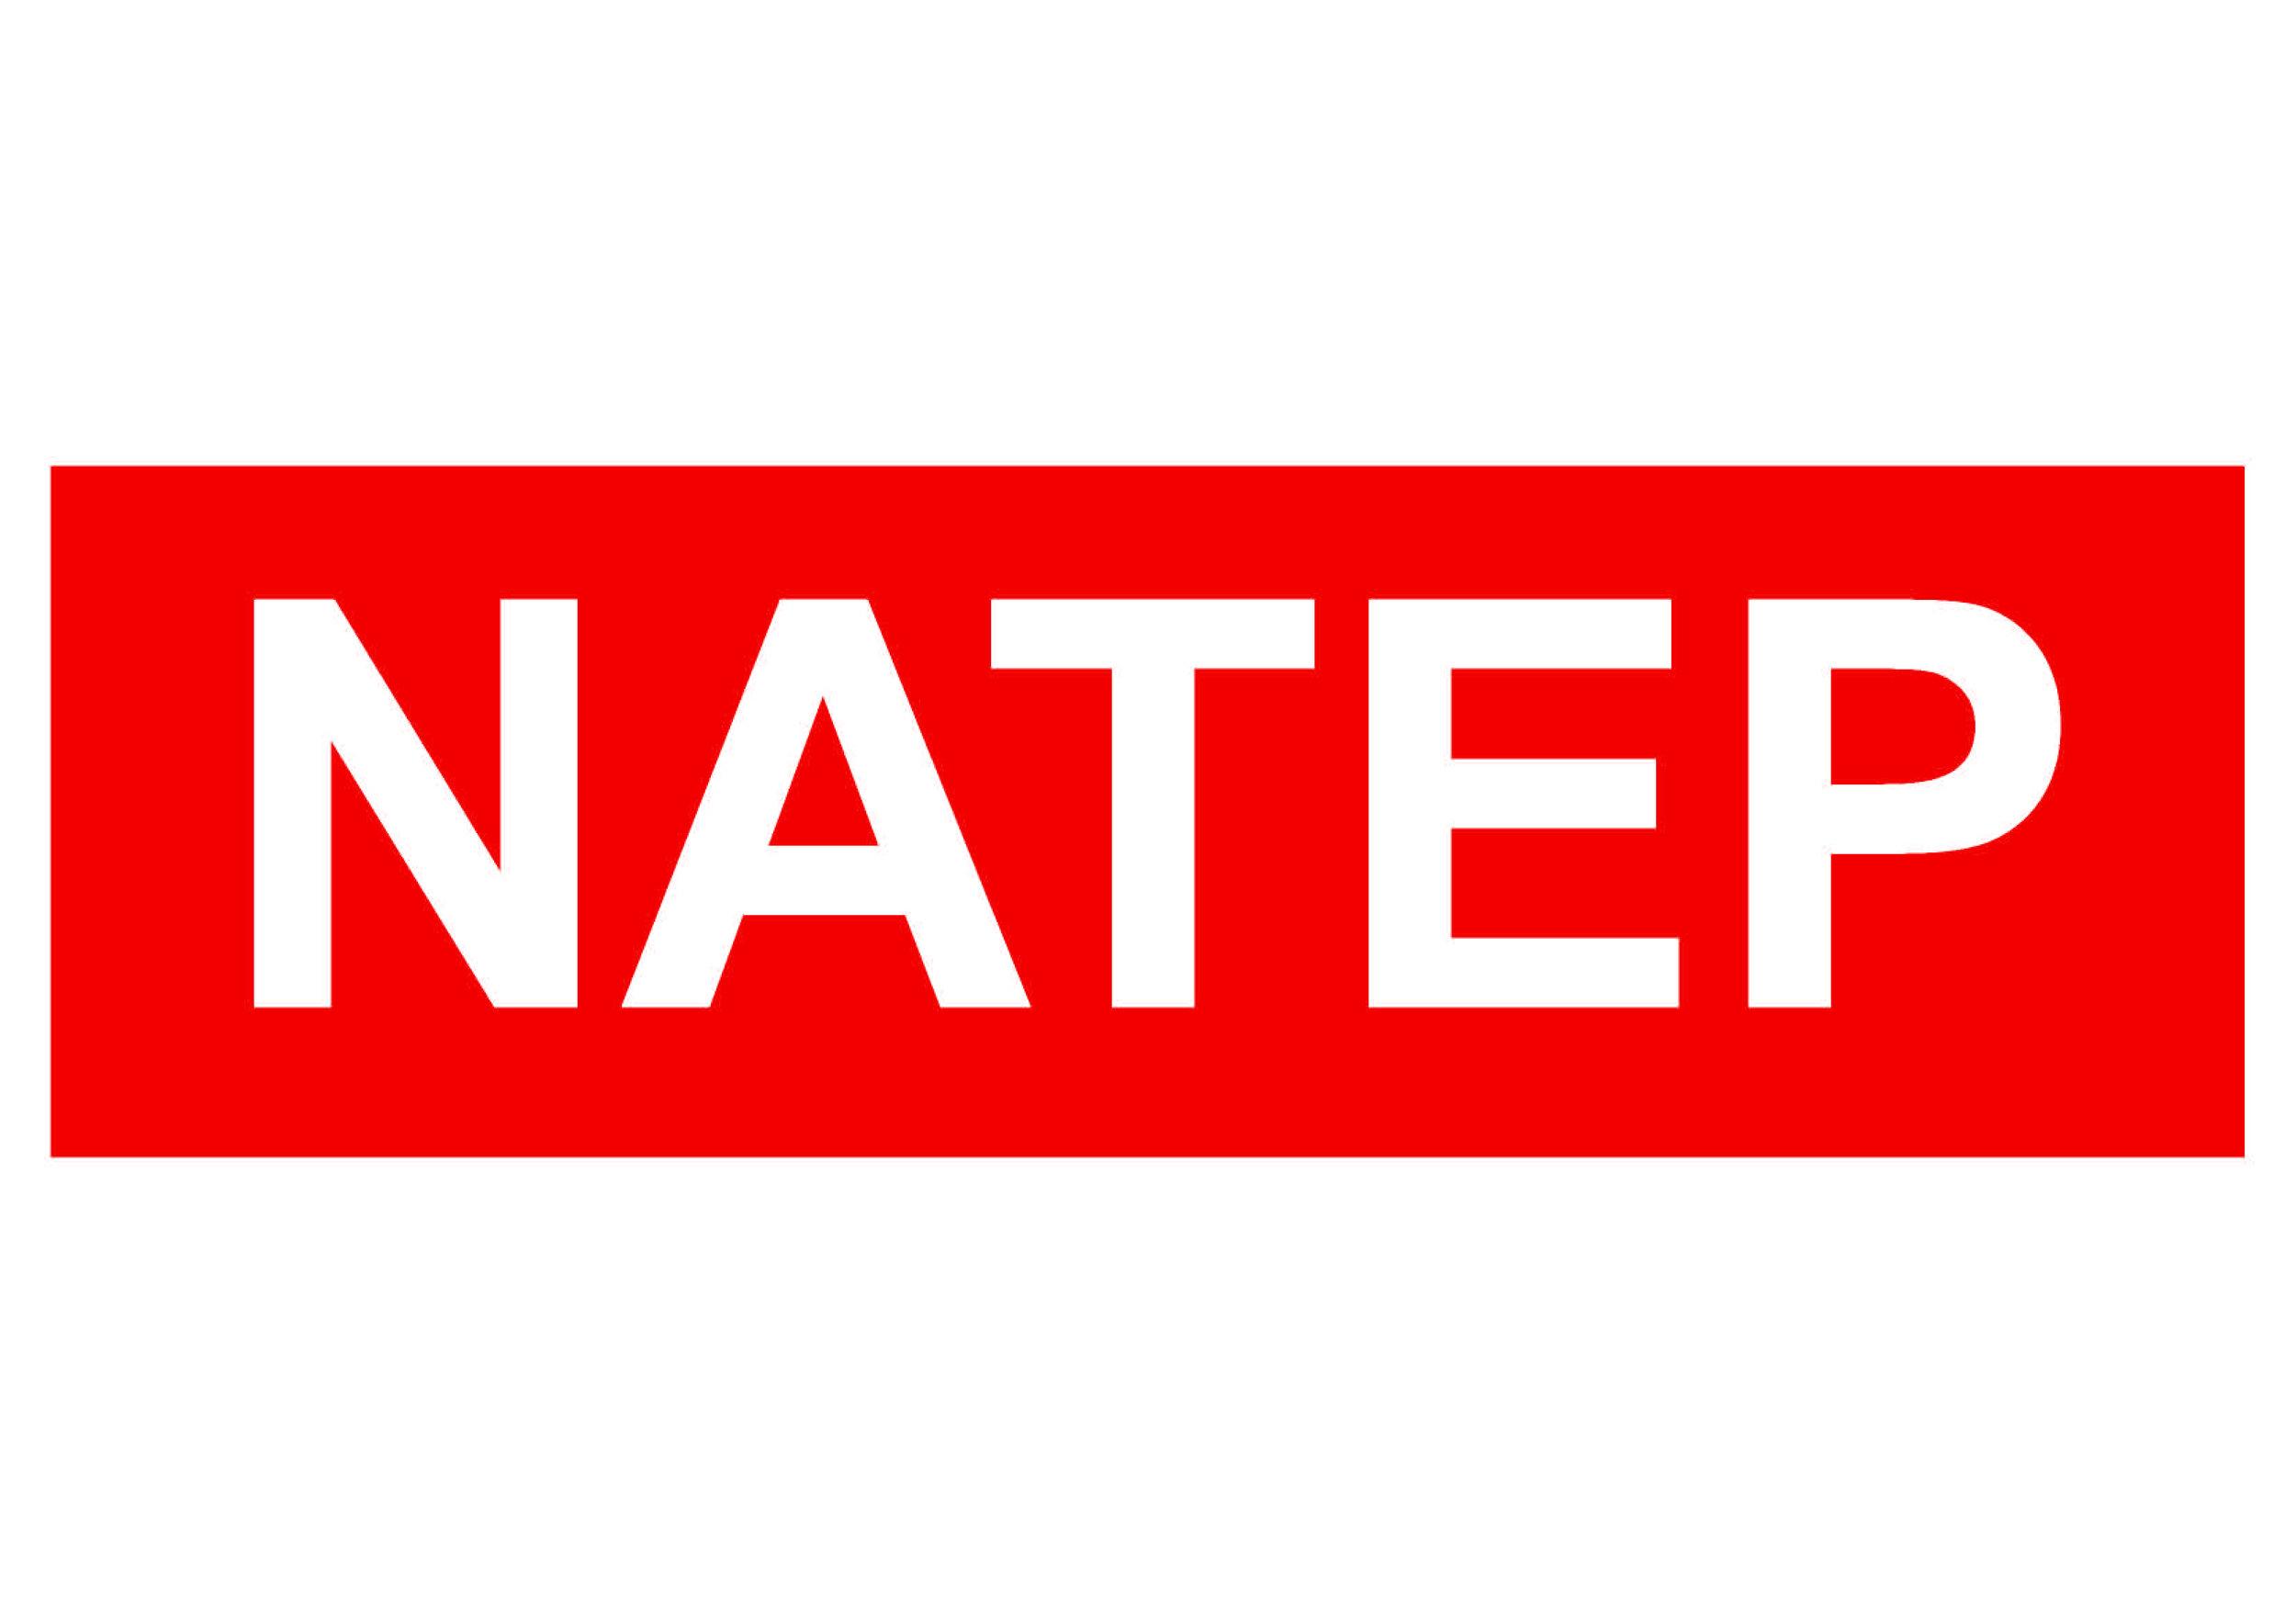 NATEP Logo White 200dpi Resolution Version (3).jpg